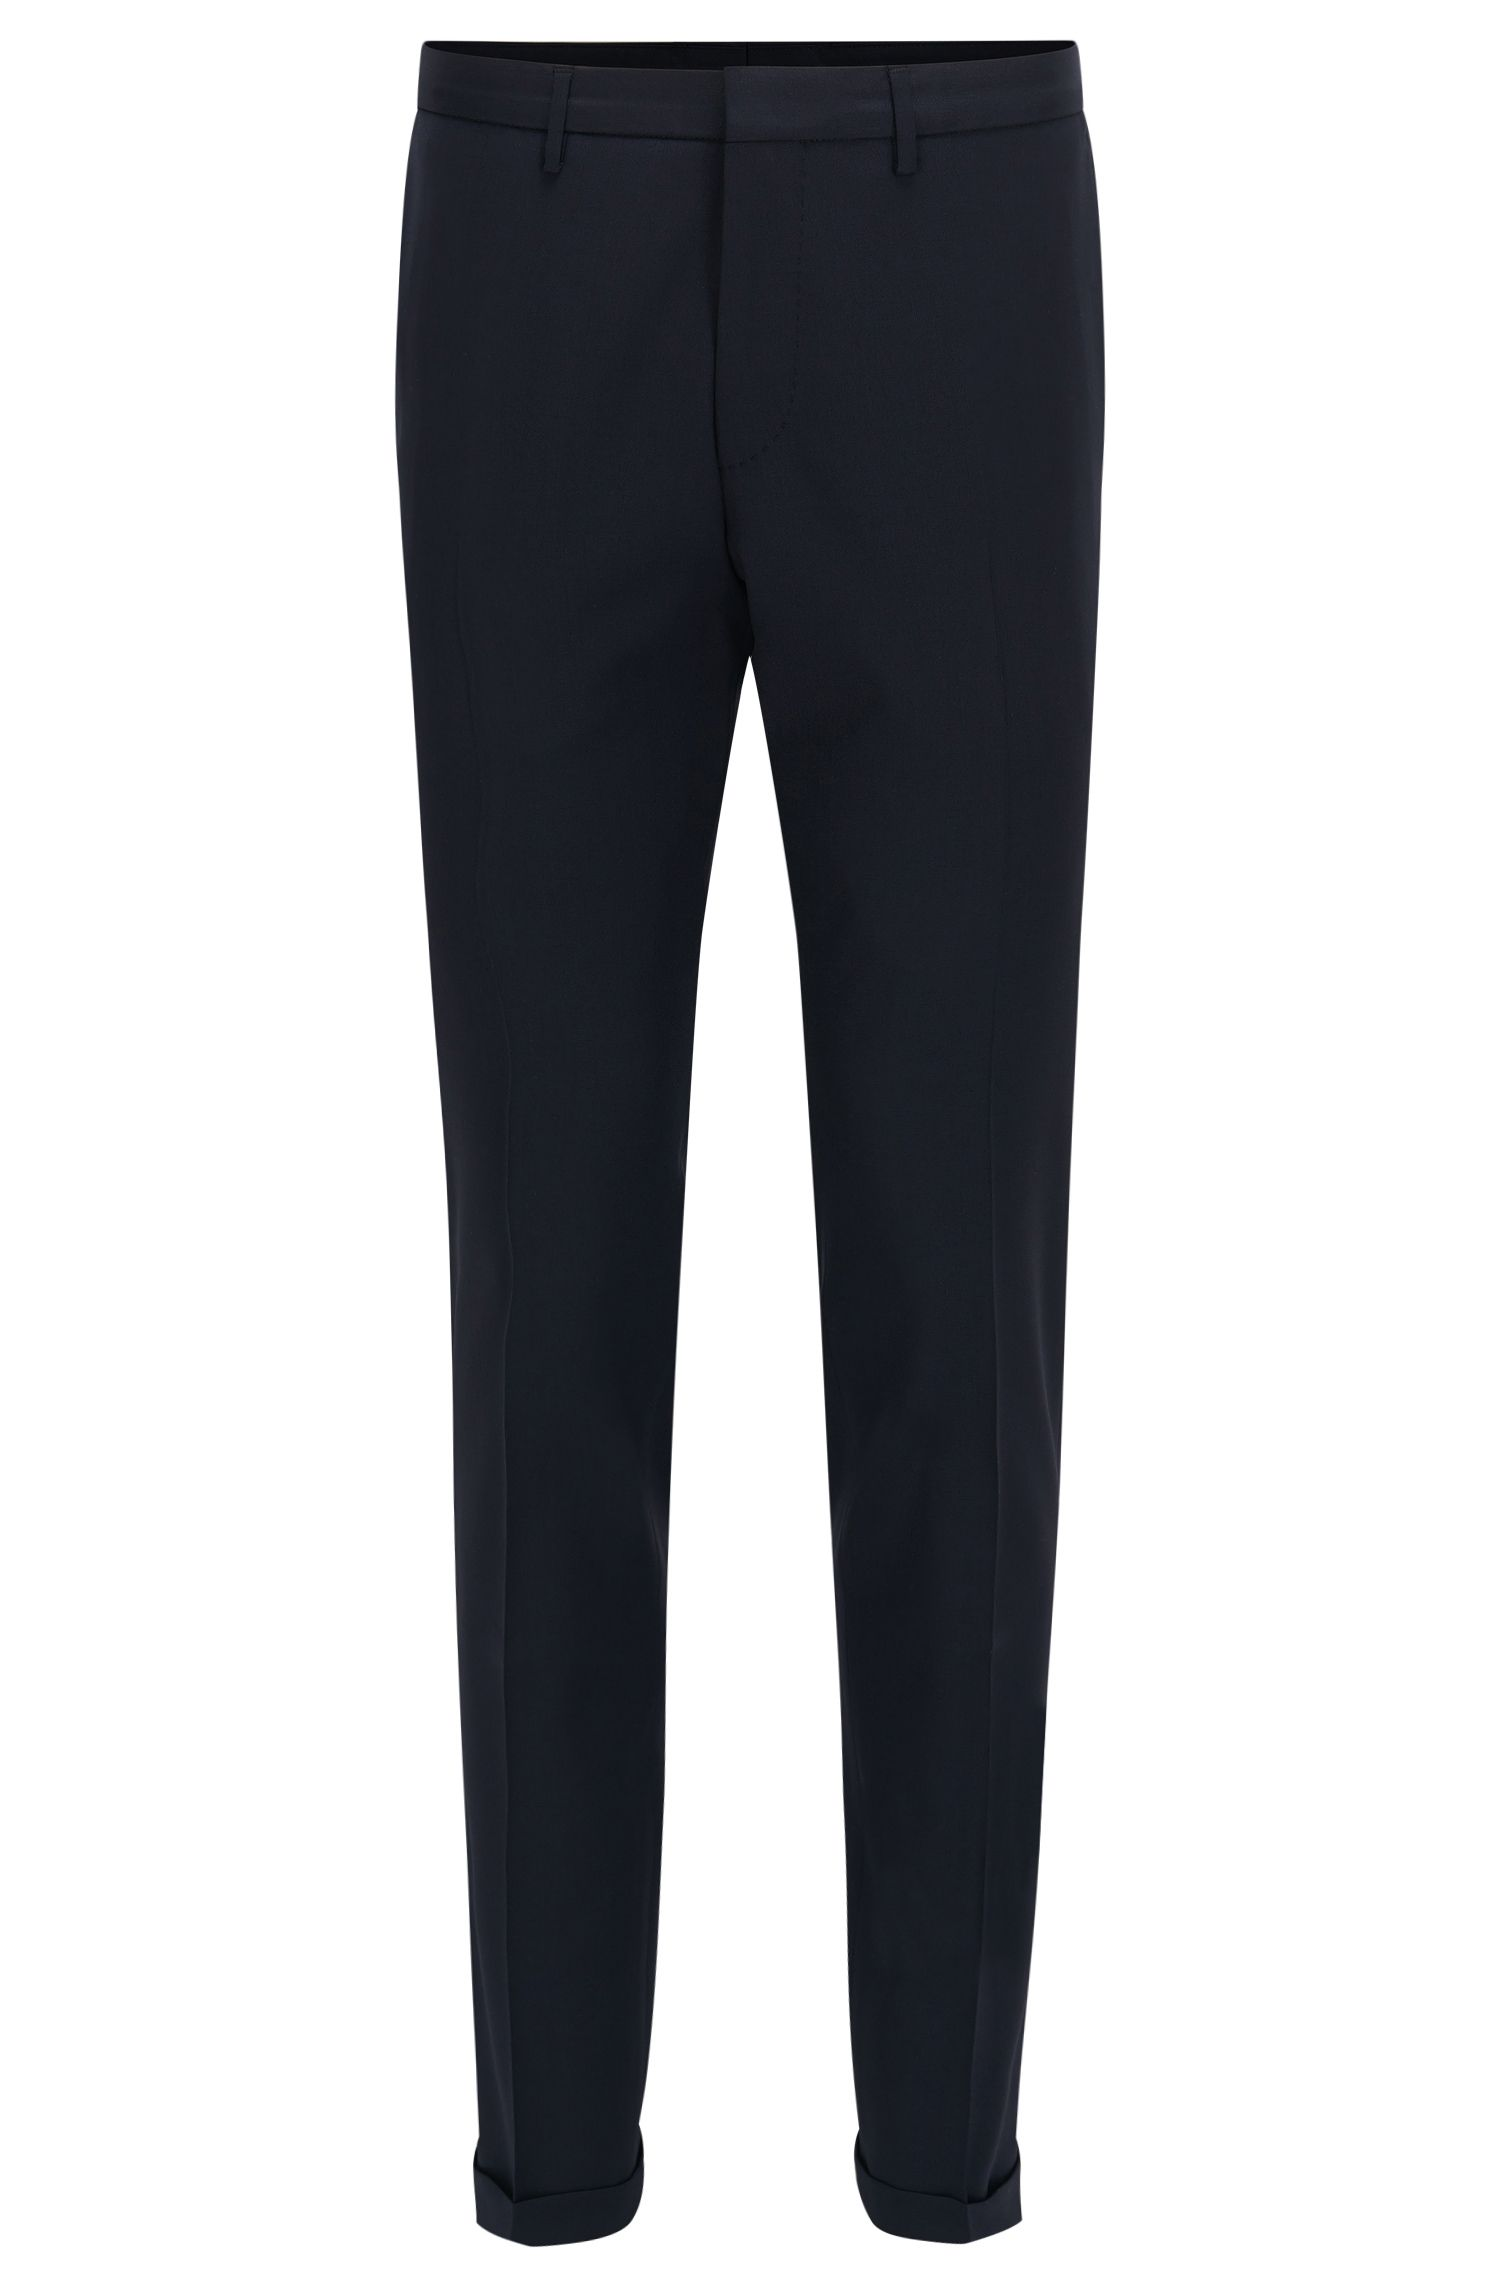 Virgin Wool Dress Pant, Extra Slim Fit | Wave CYL, Dark Blue